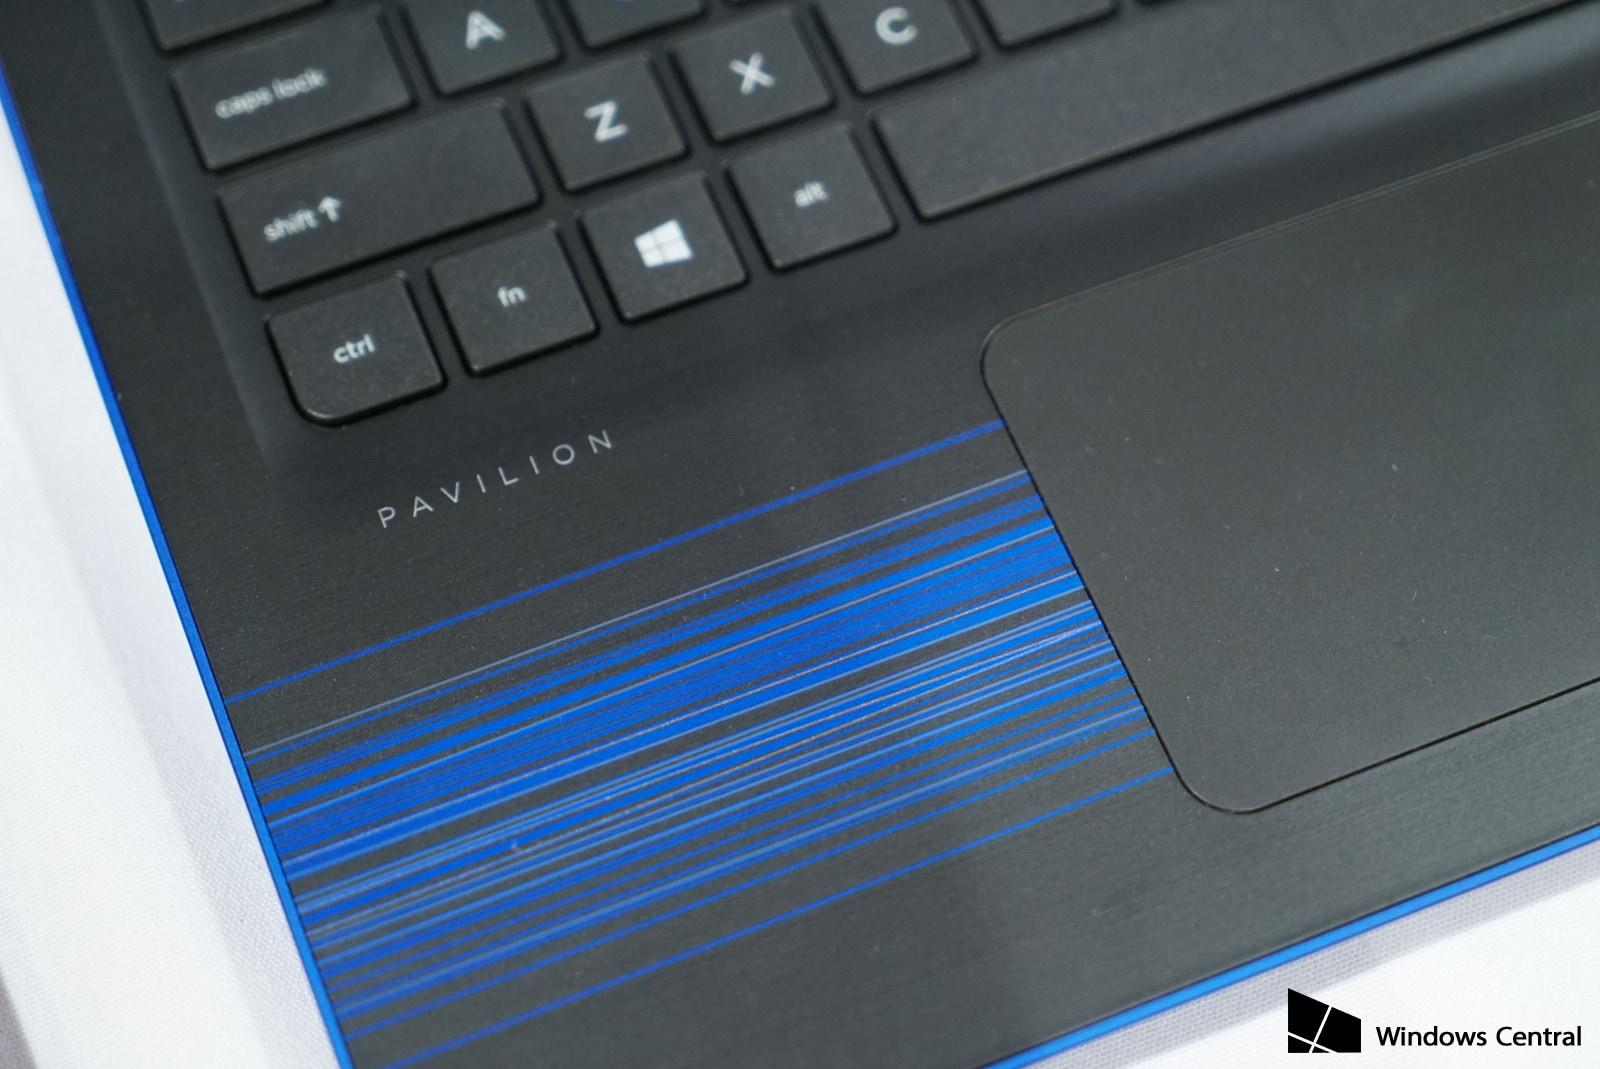 HP Pavillion Thin and Light_1